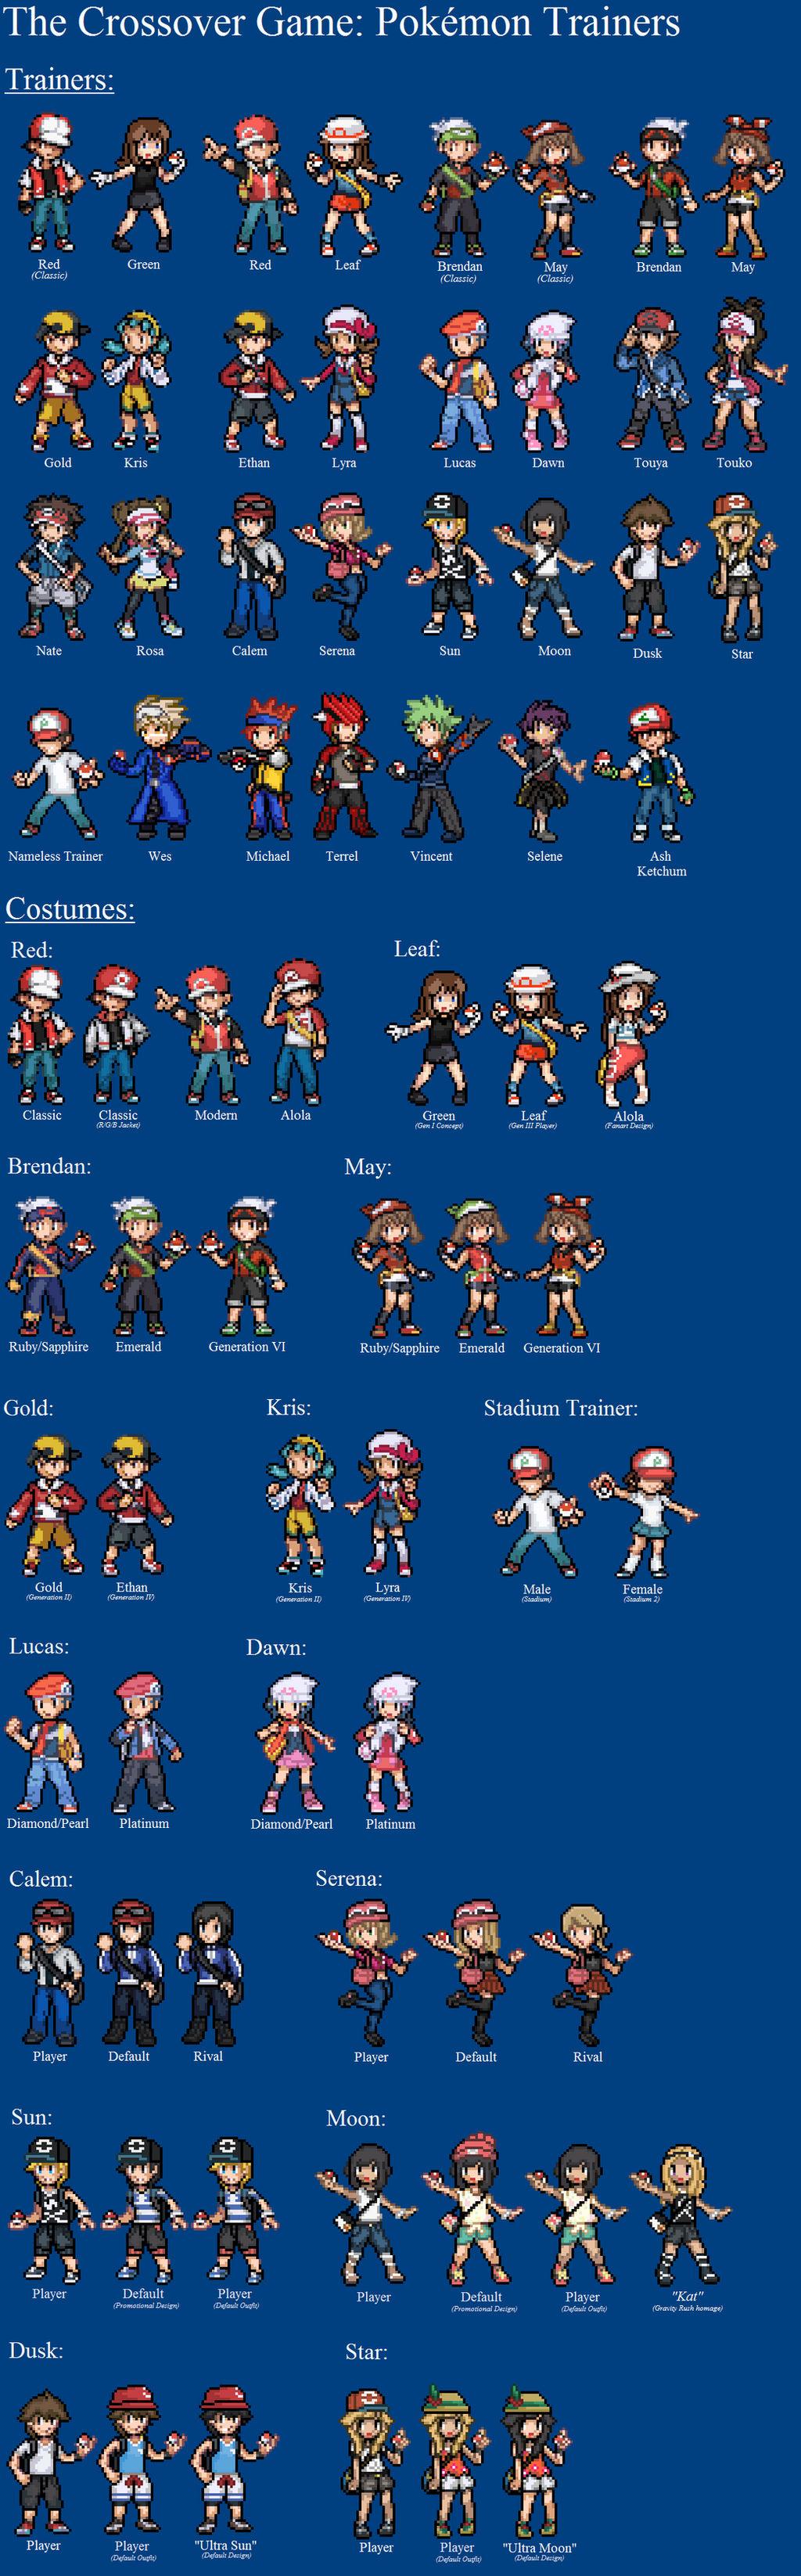 Pokemon Trainer Sprites by LeeHatake93 on DeviantArt